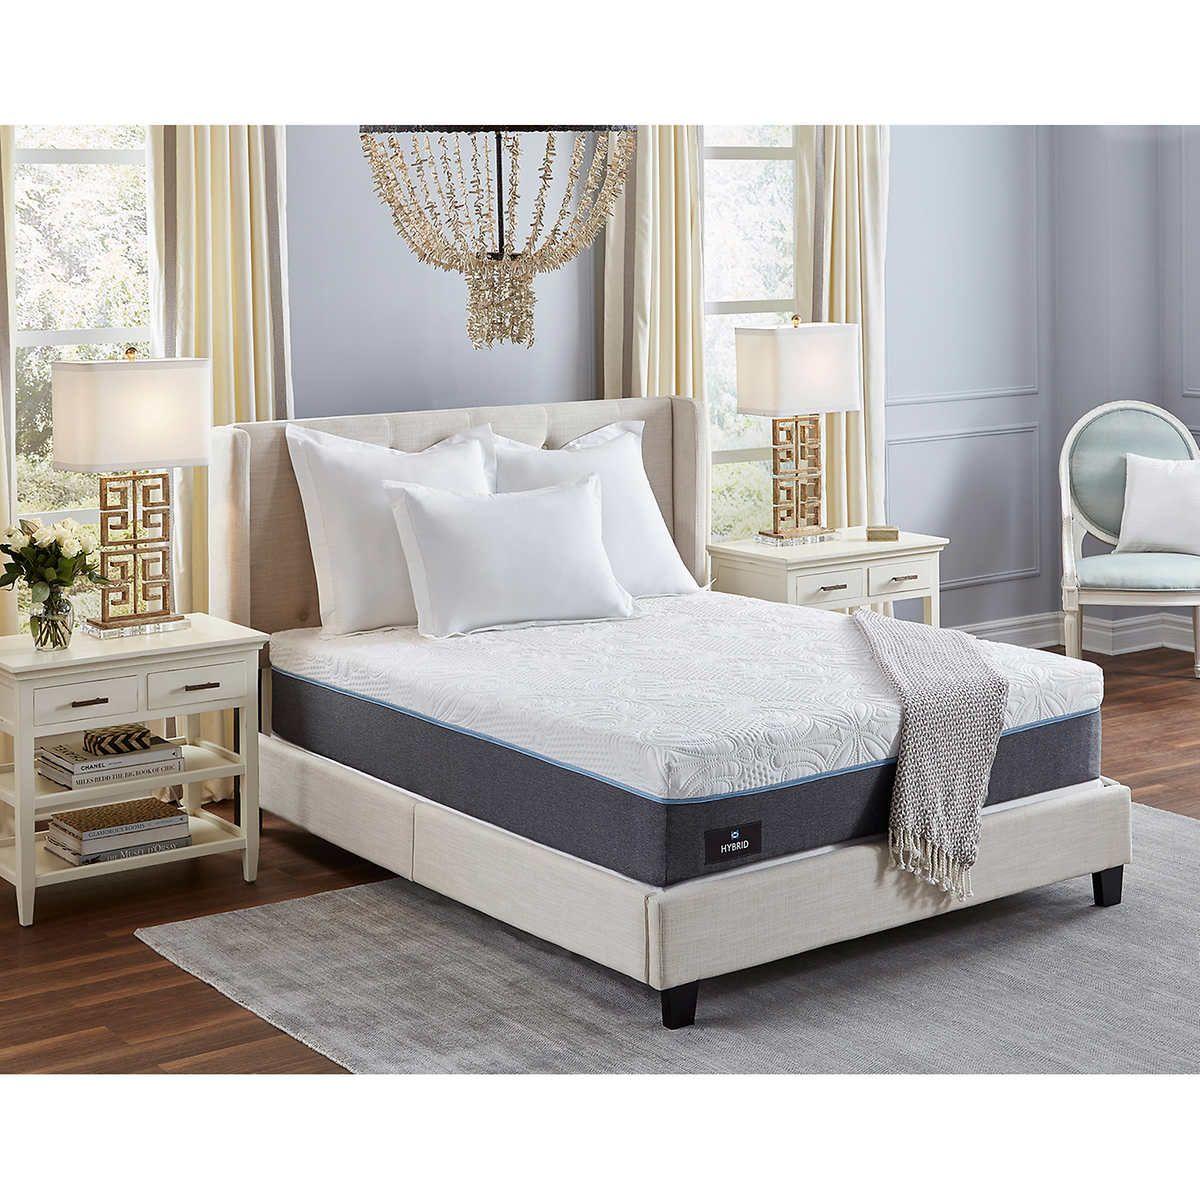 Sealy 12 King Size Mattress Bed Mattress